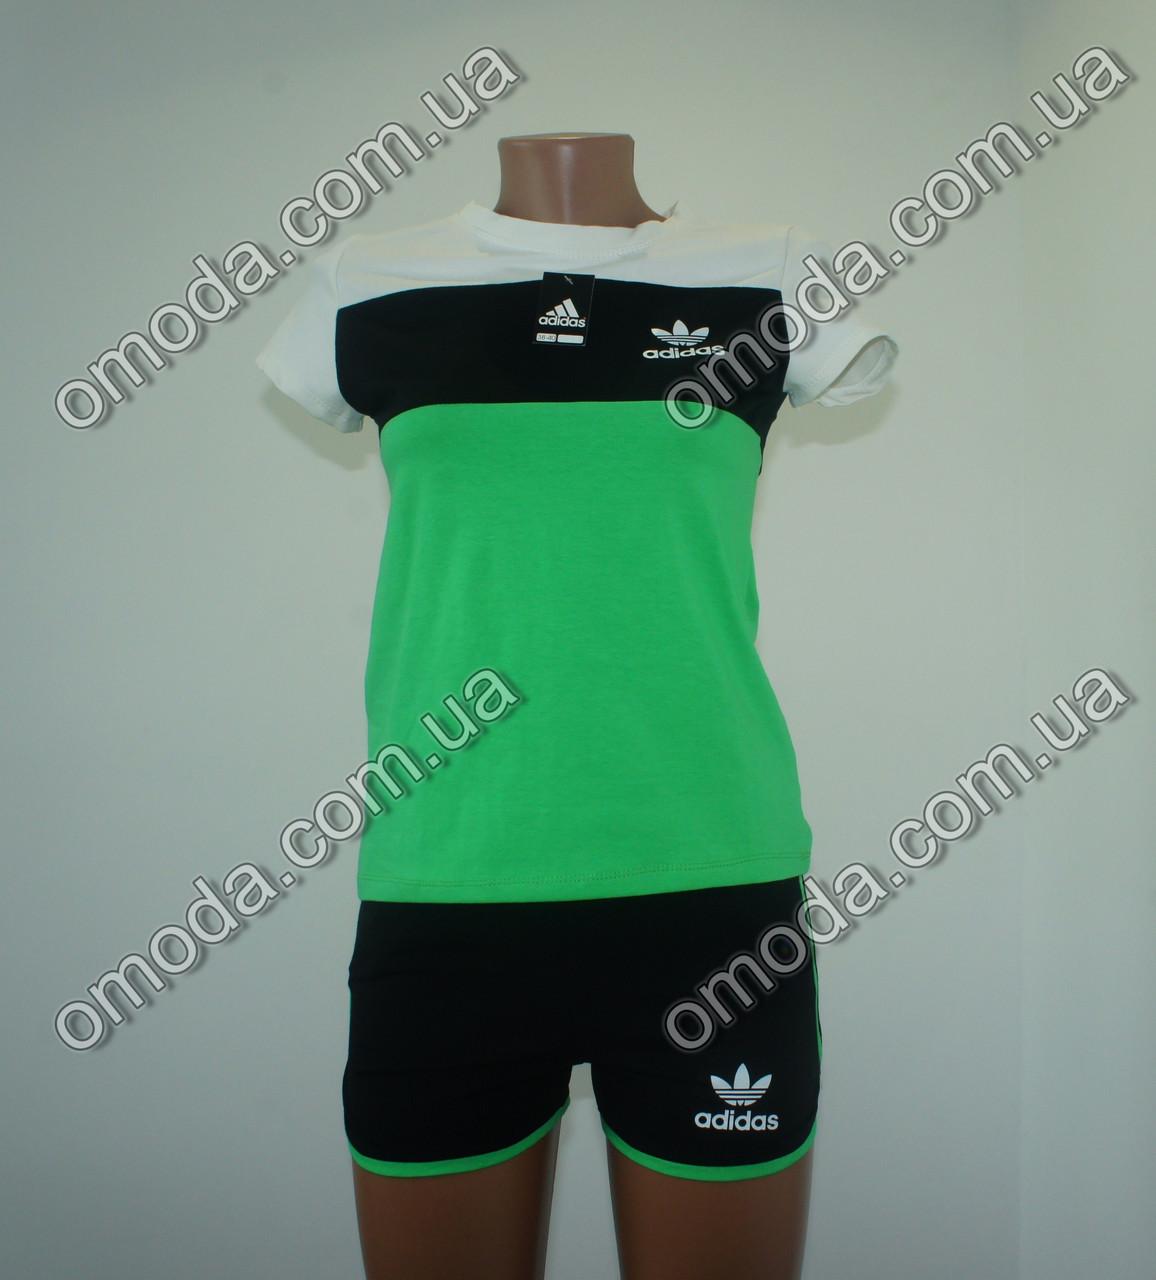 Женский спортивний костюм с шортами зеленого цвета